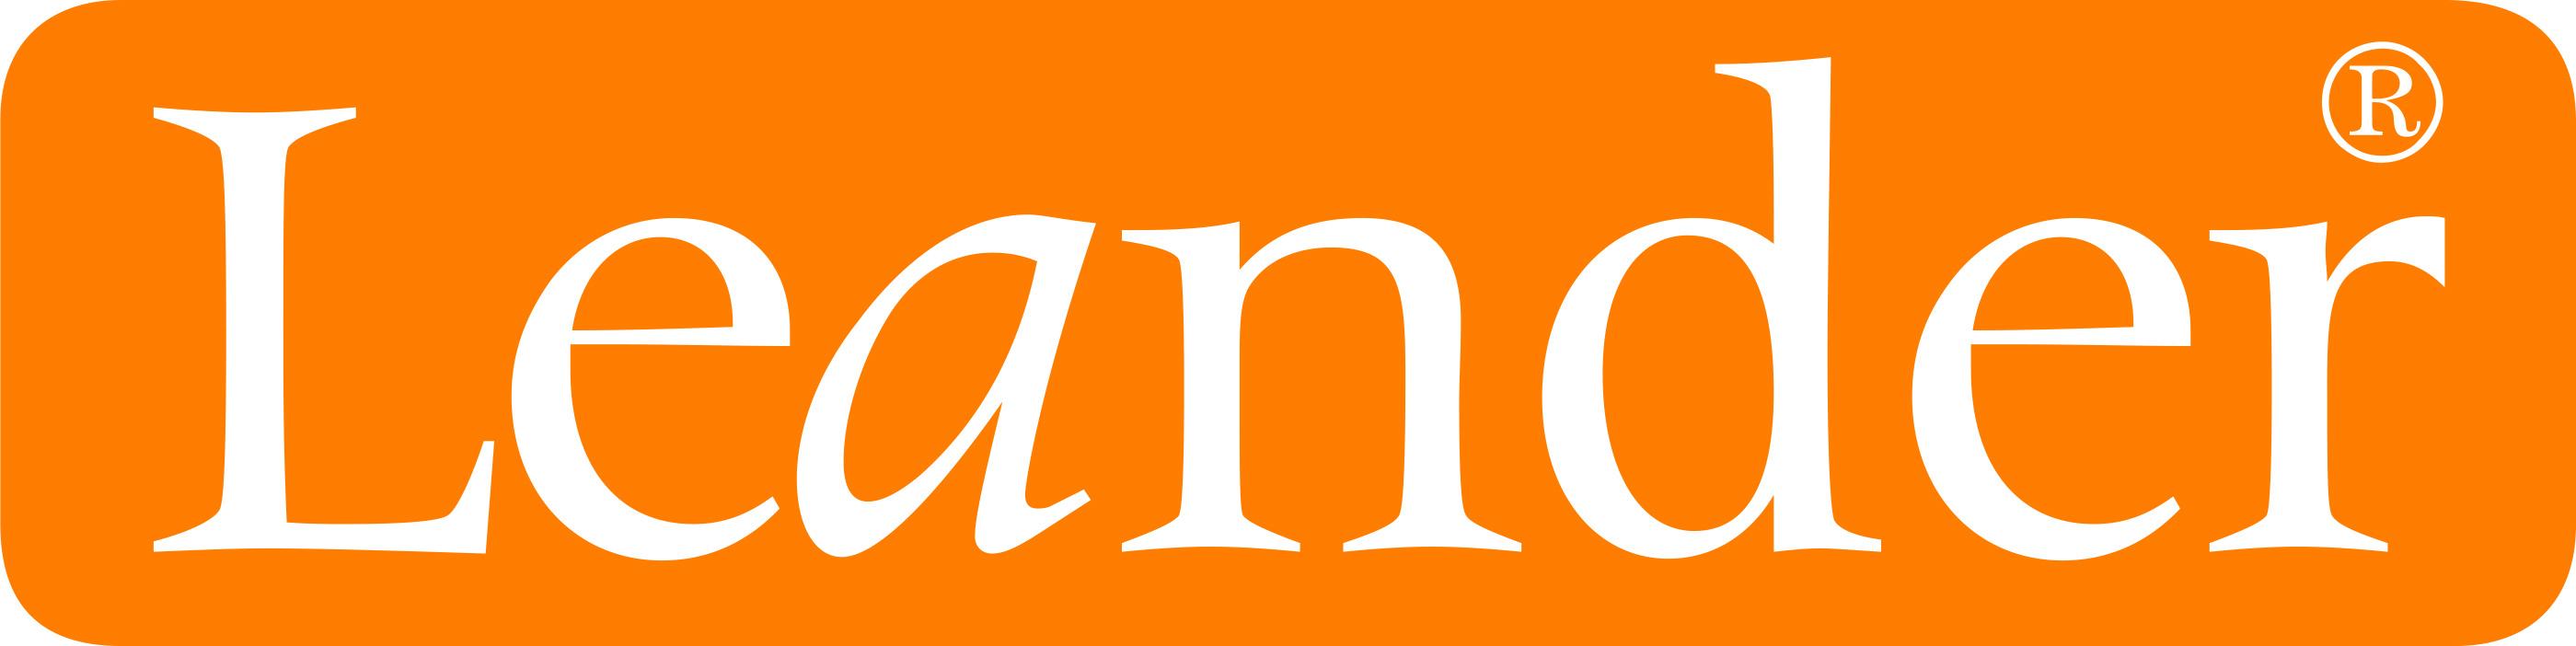 Logo_leander_rounded_corners.jpg